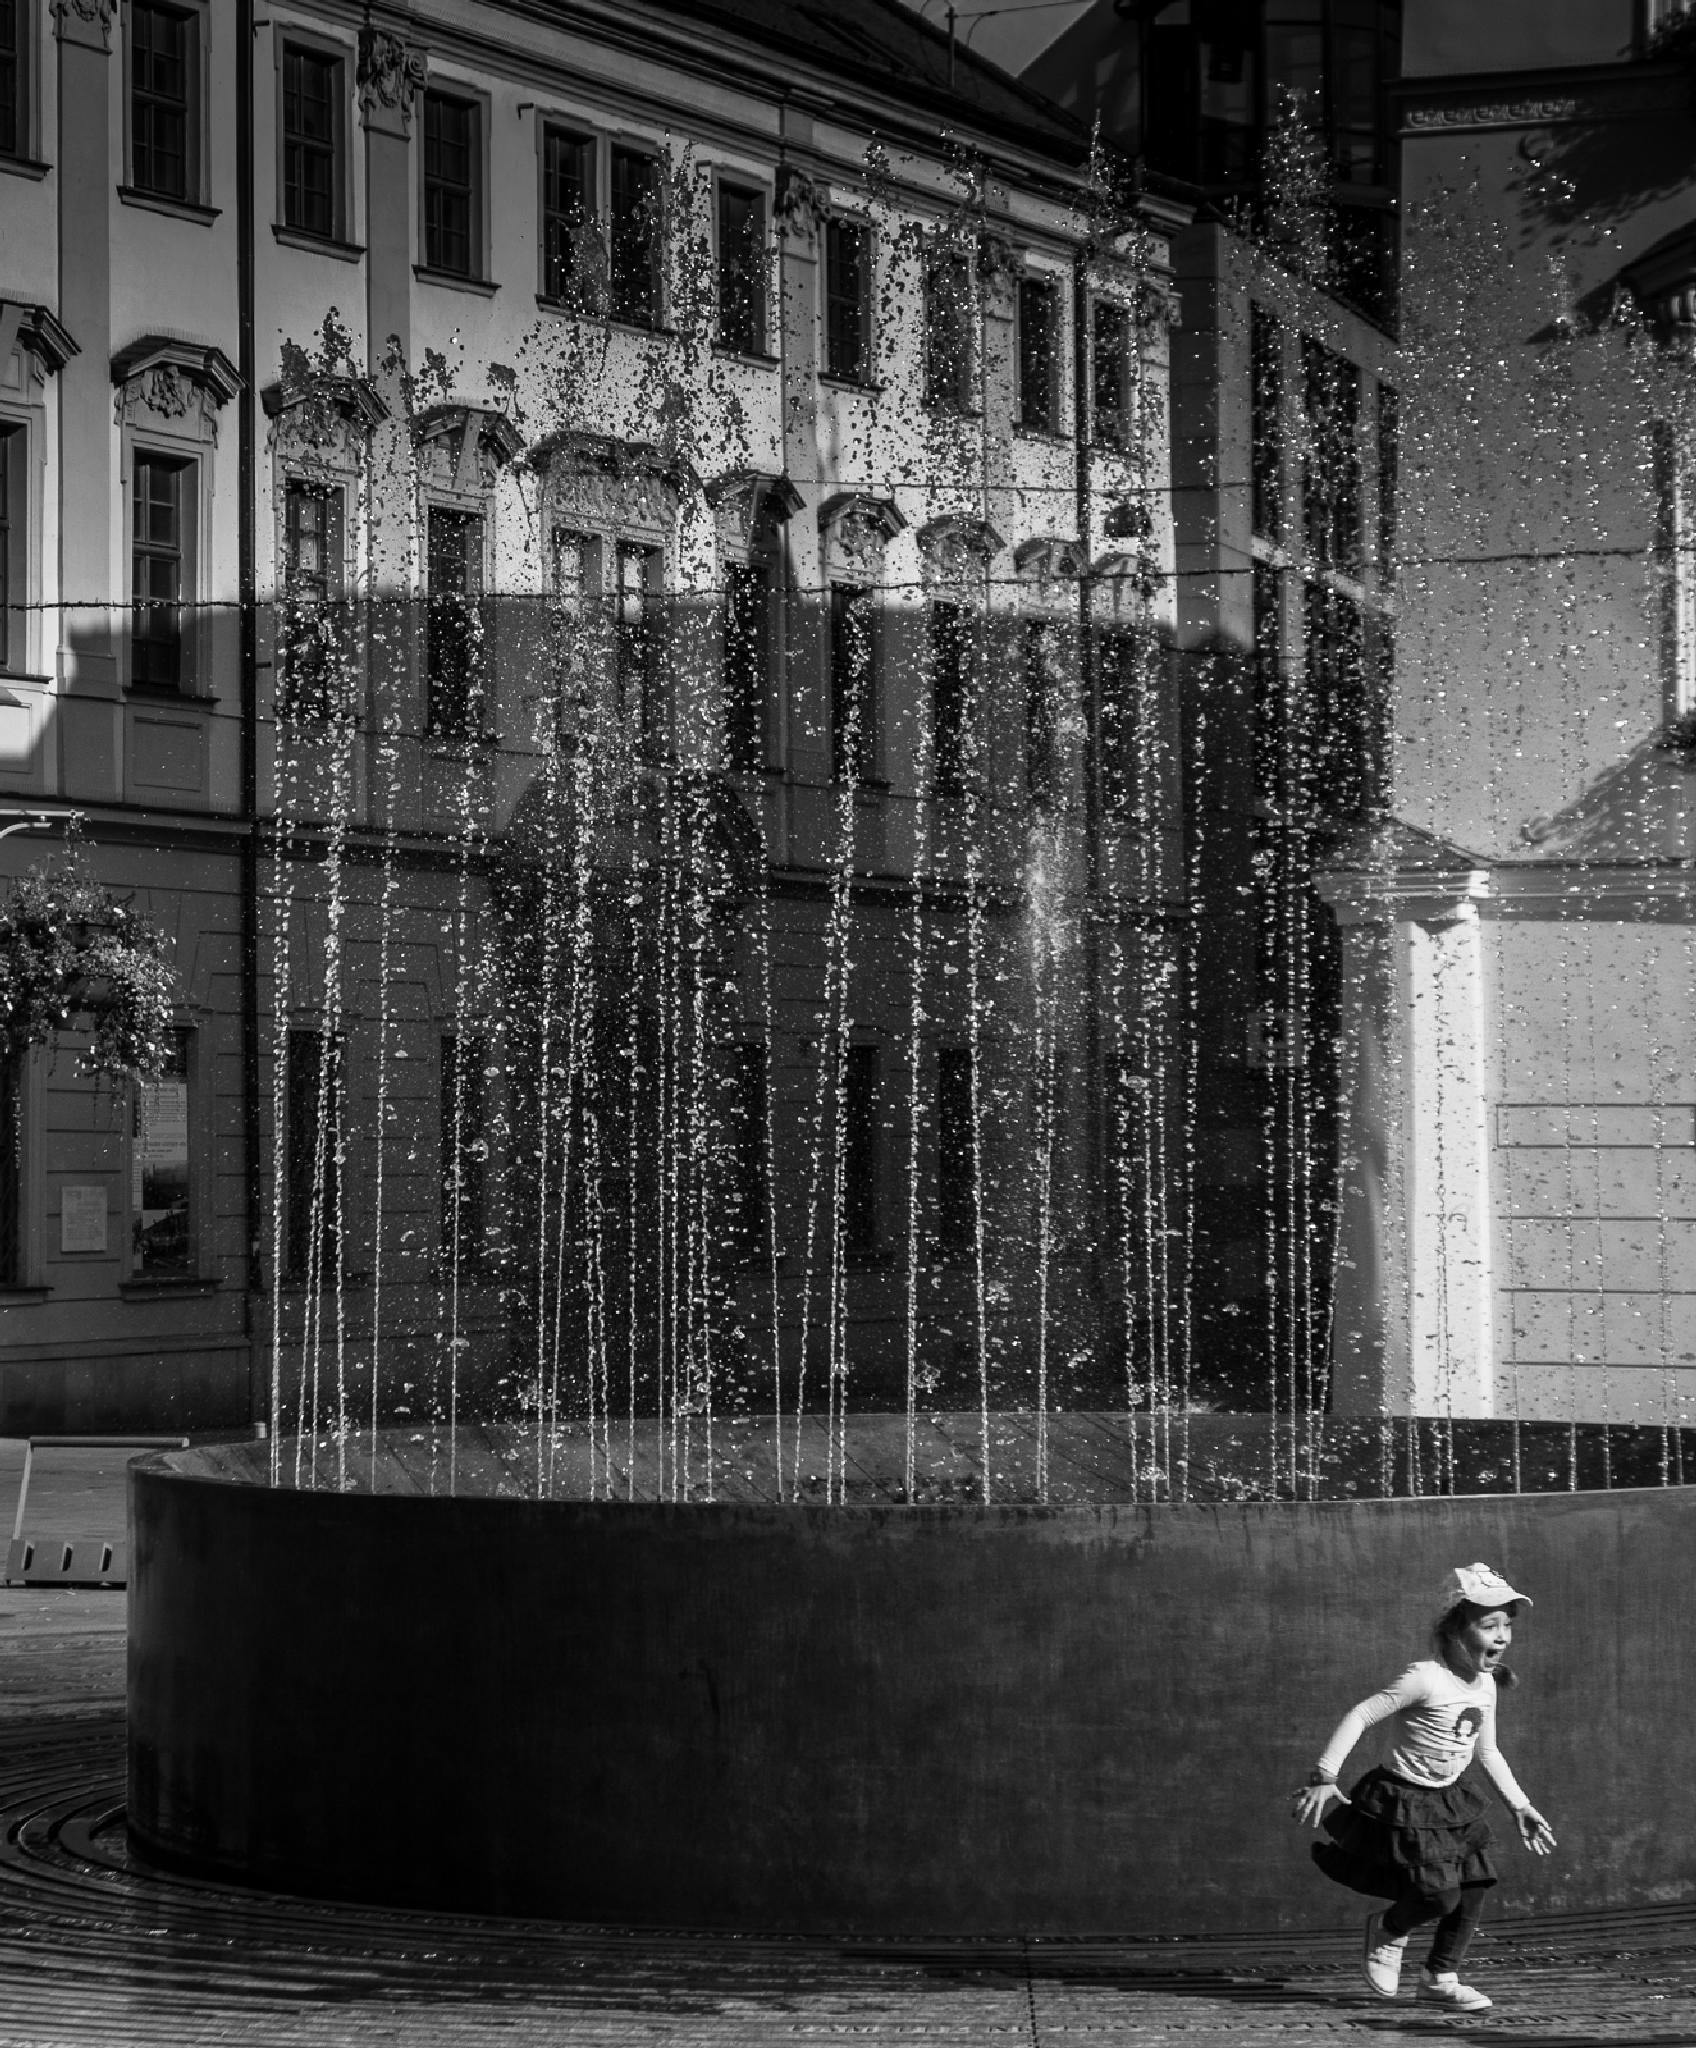 Splash! by IvanEs